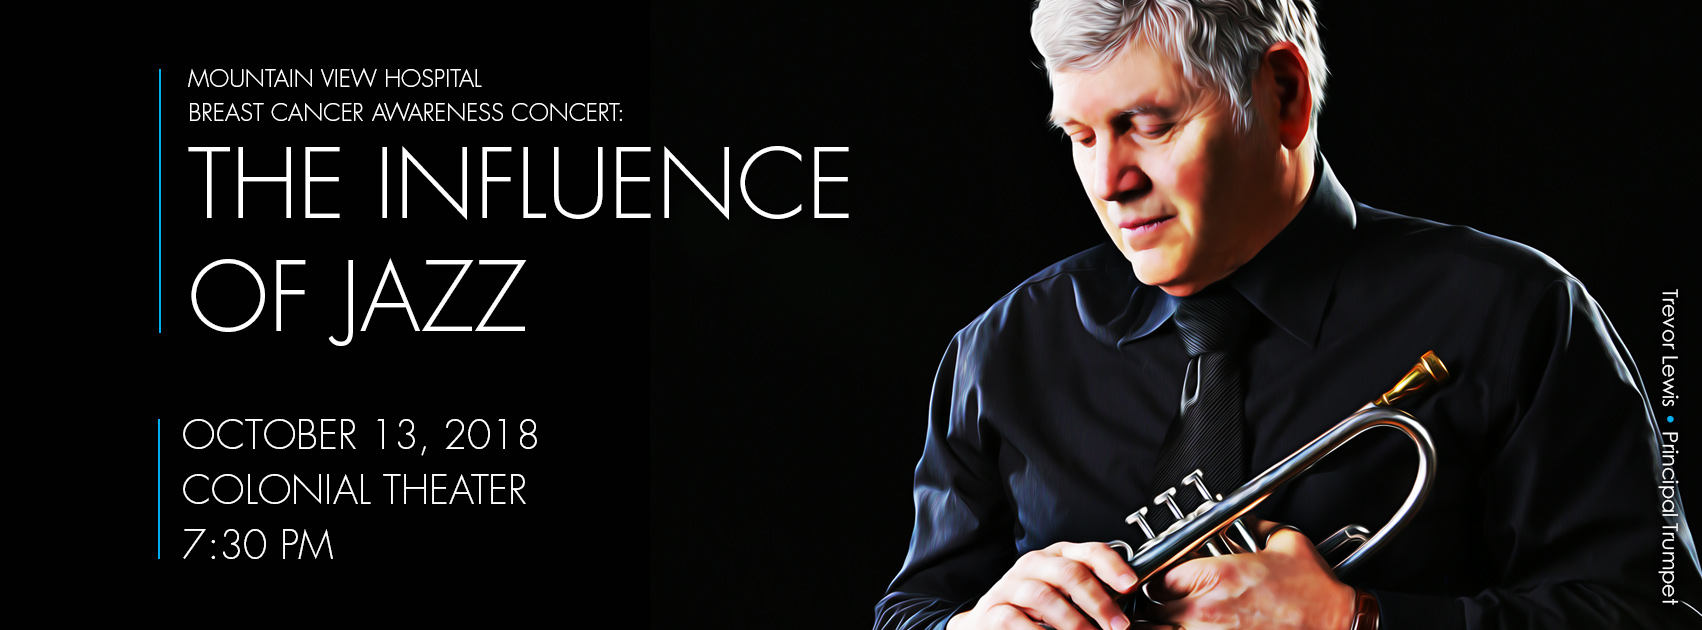 FB_InfluenceOfJazz_COVER.jpg